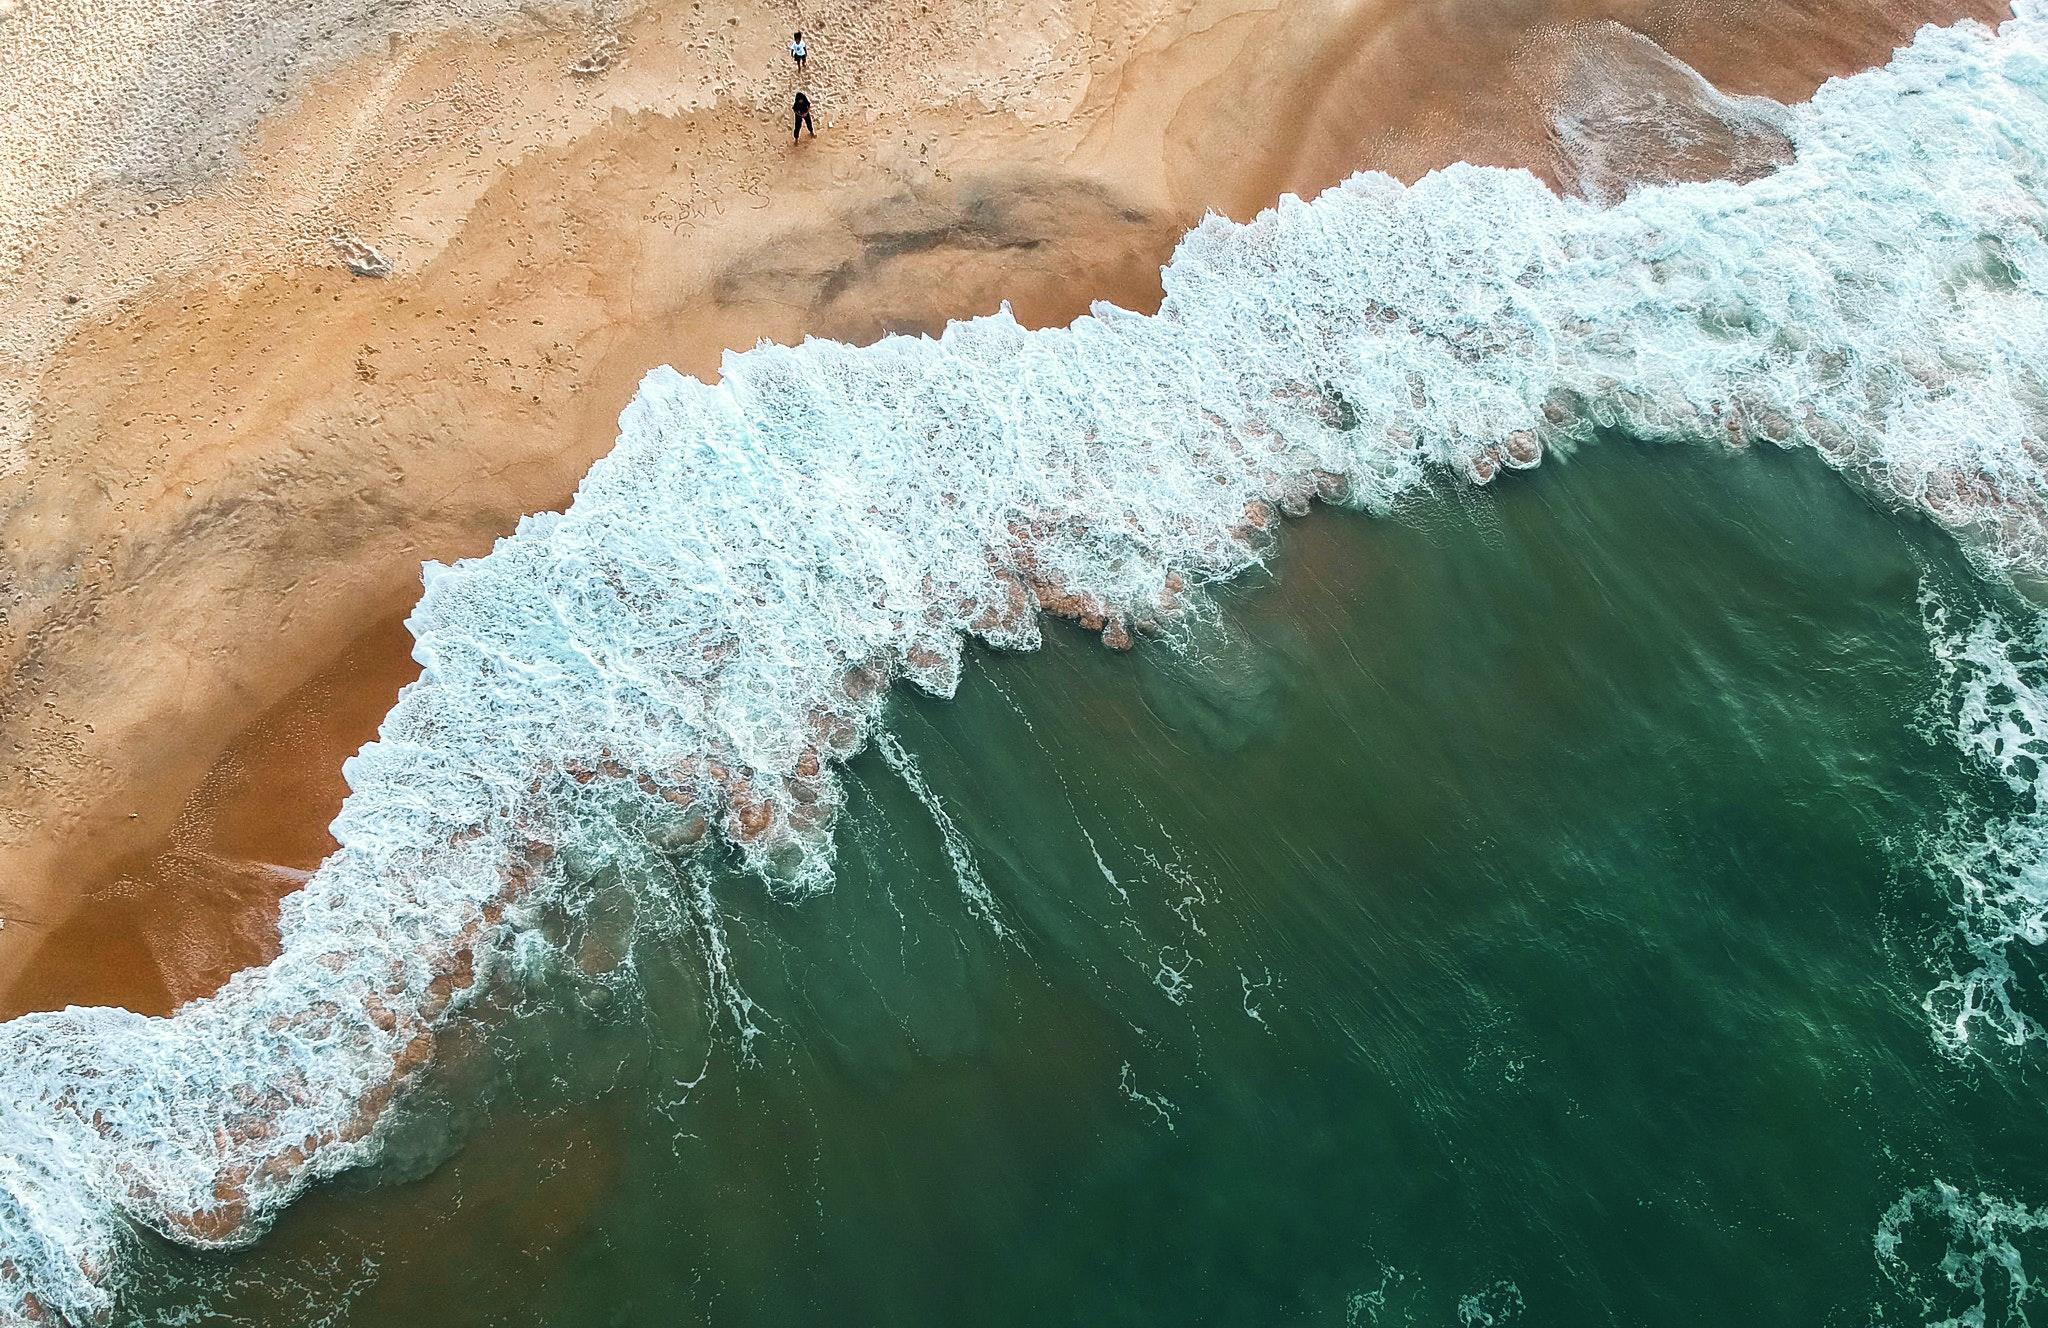 Mac Wallpapers Pexels Free Stock Photos